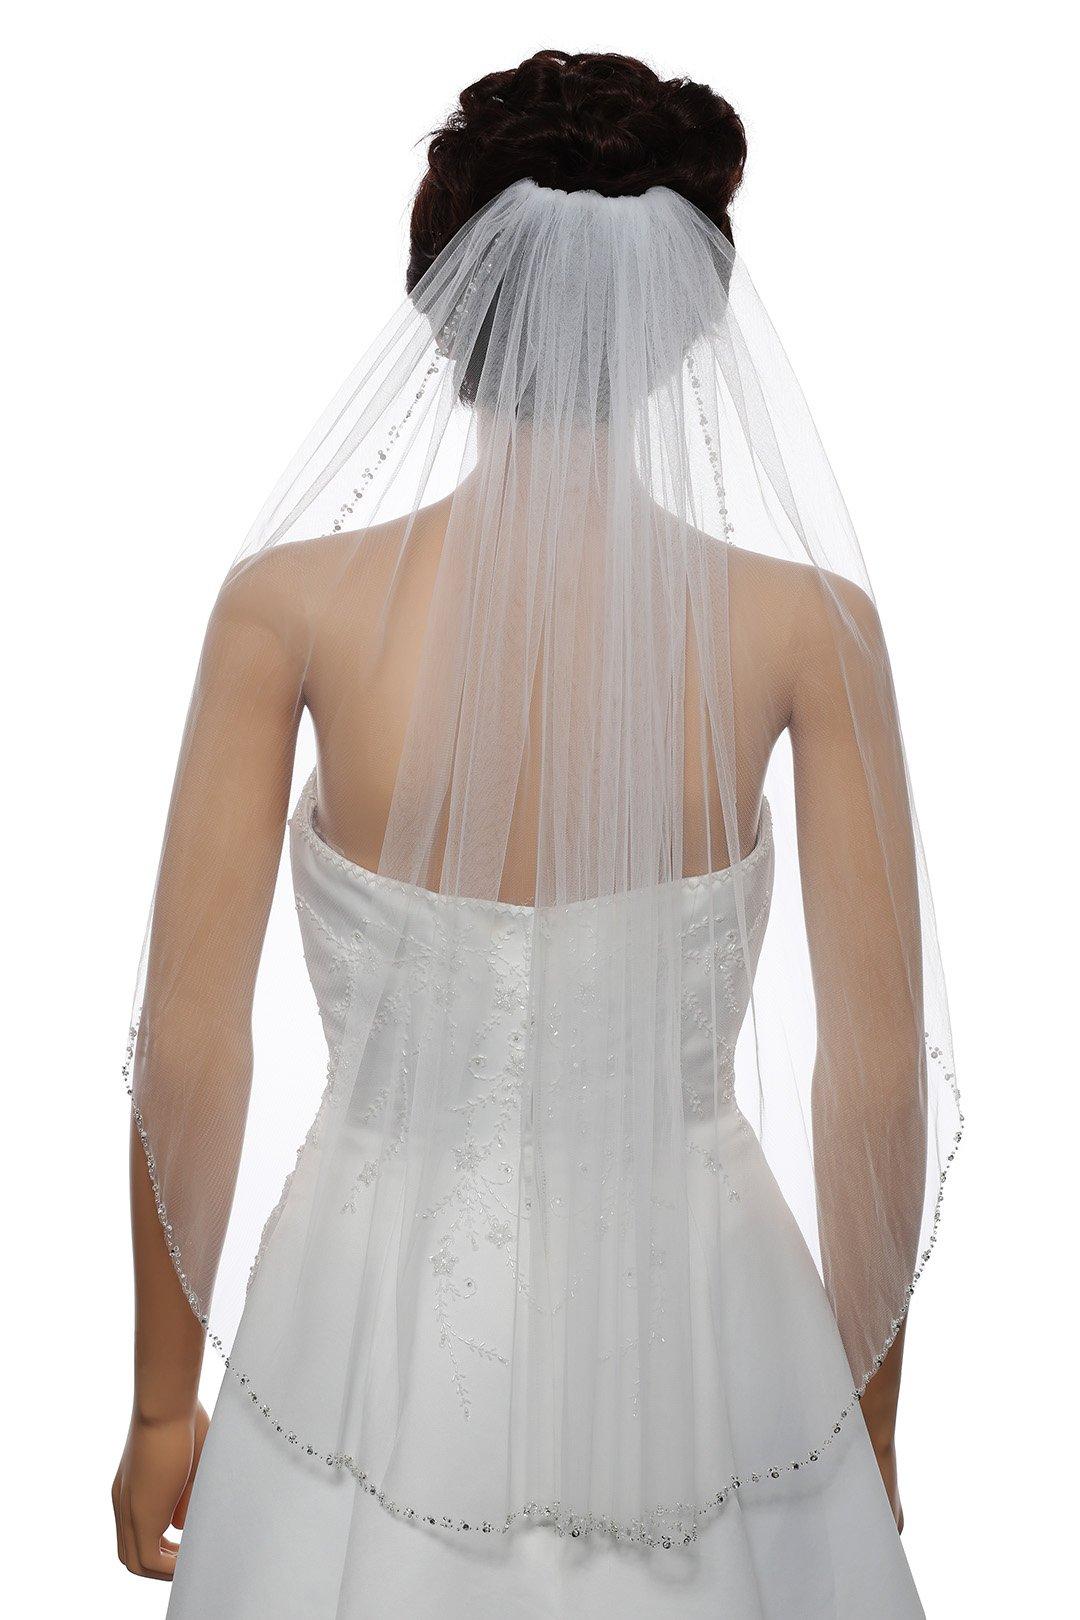 1T Rhinestone Pearl Sequin Beaded Wedding Veil - Ivory Elbow Length 30'' V479